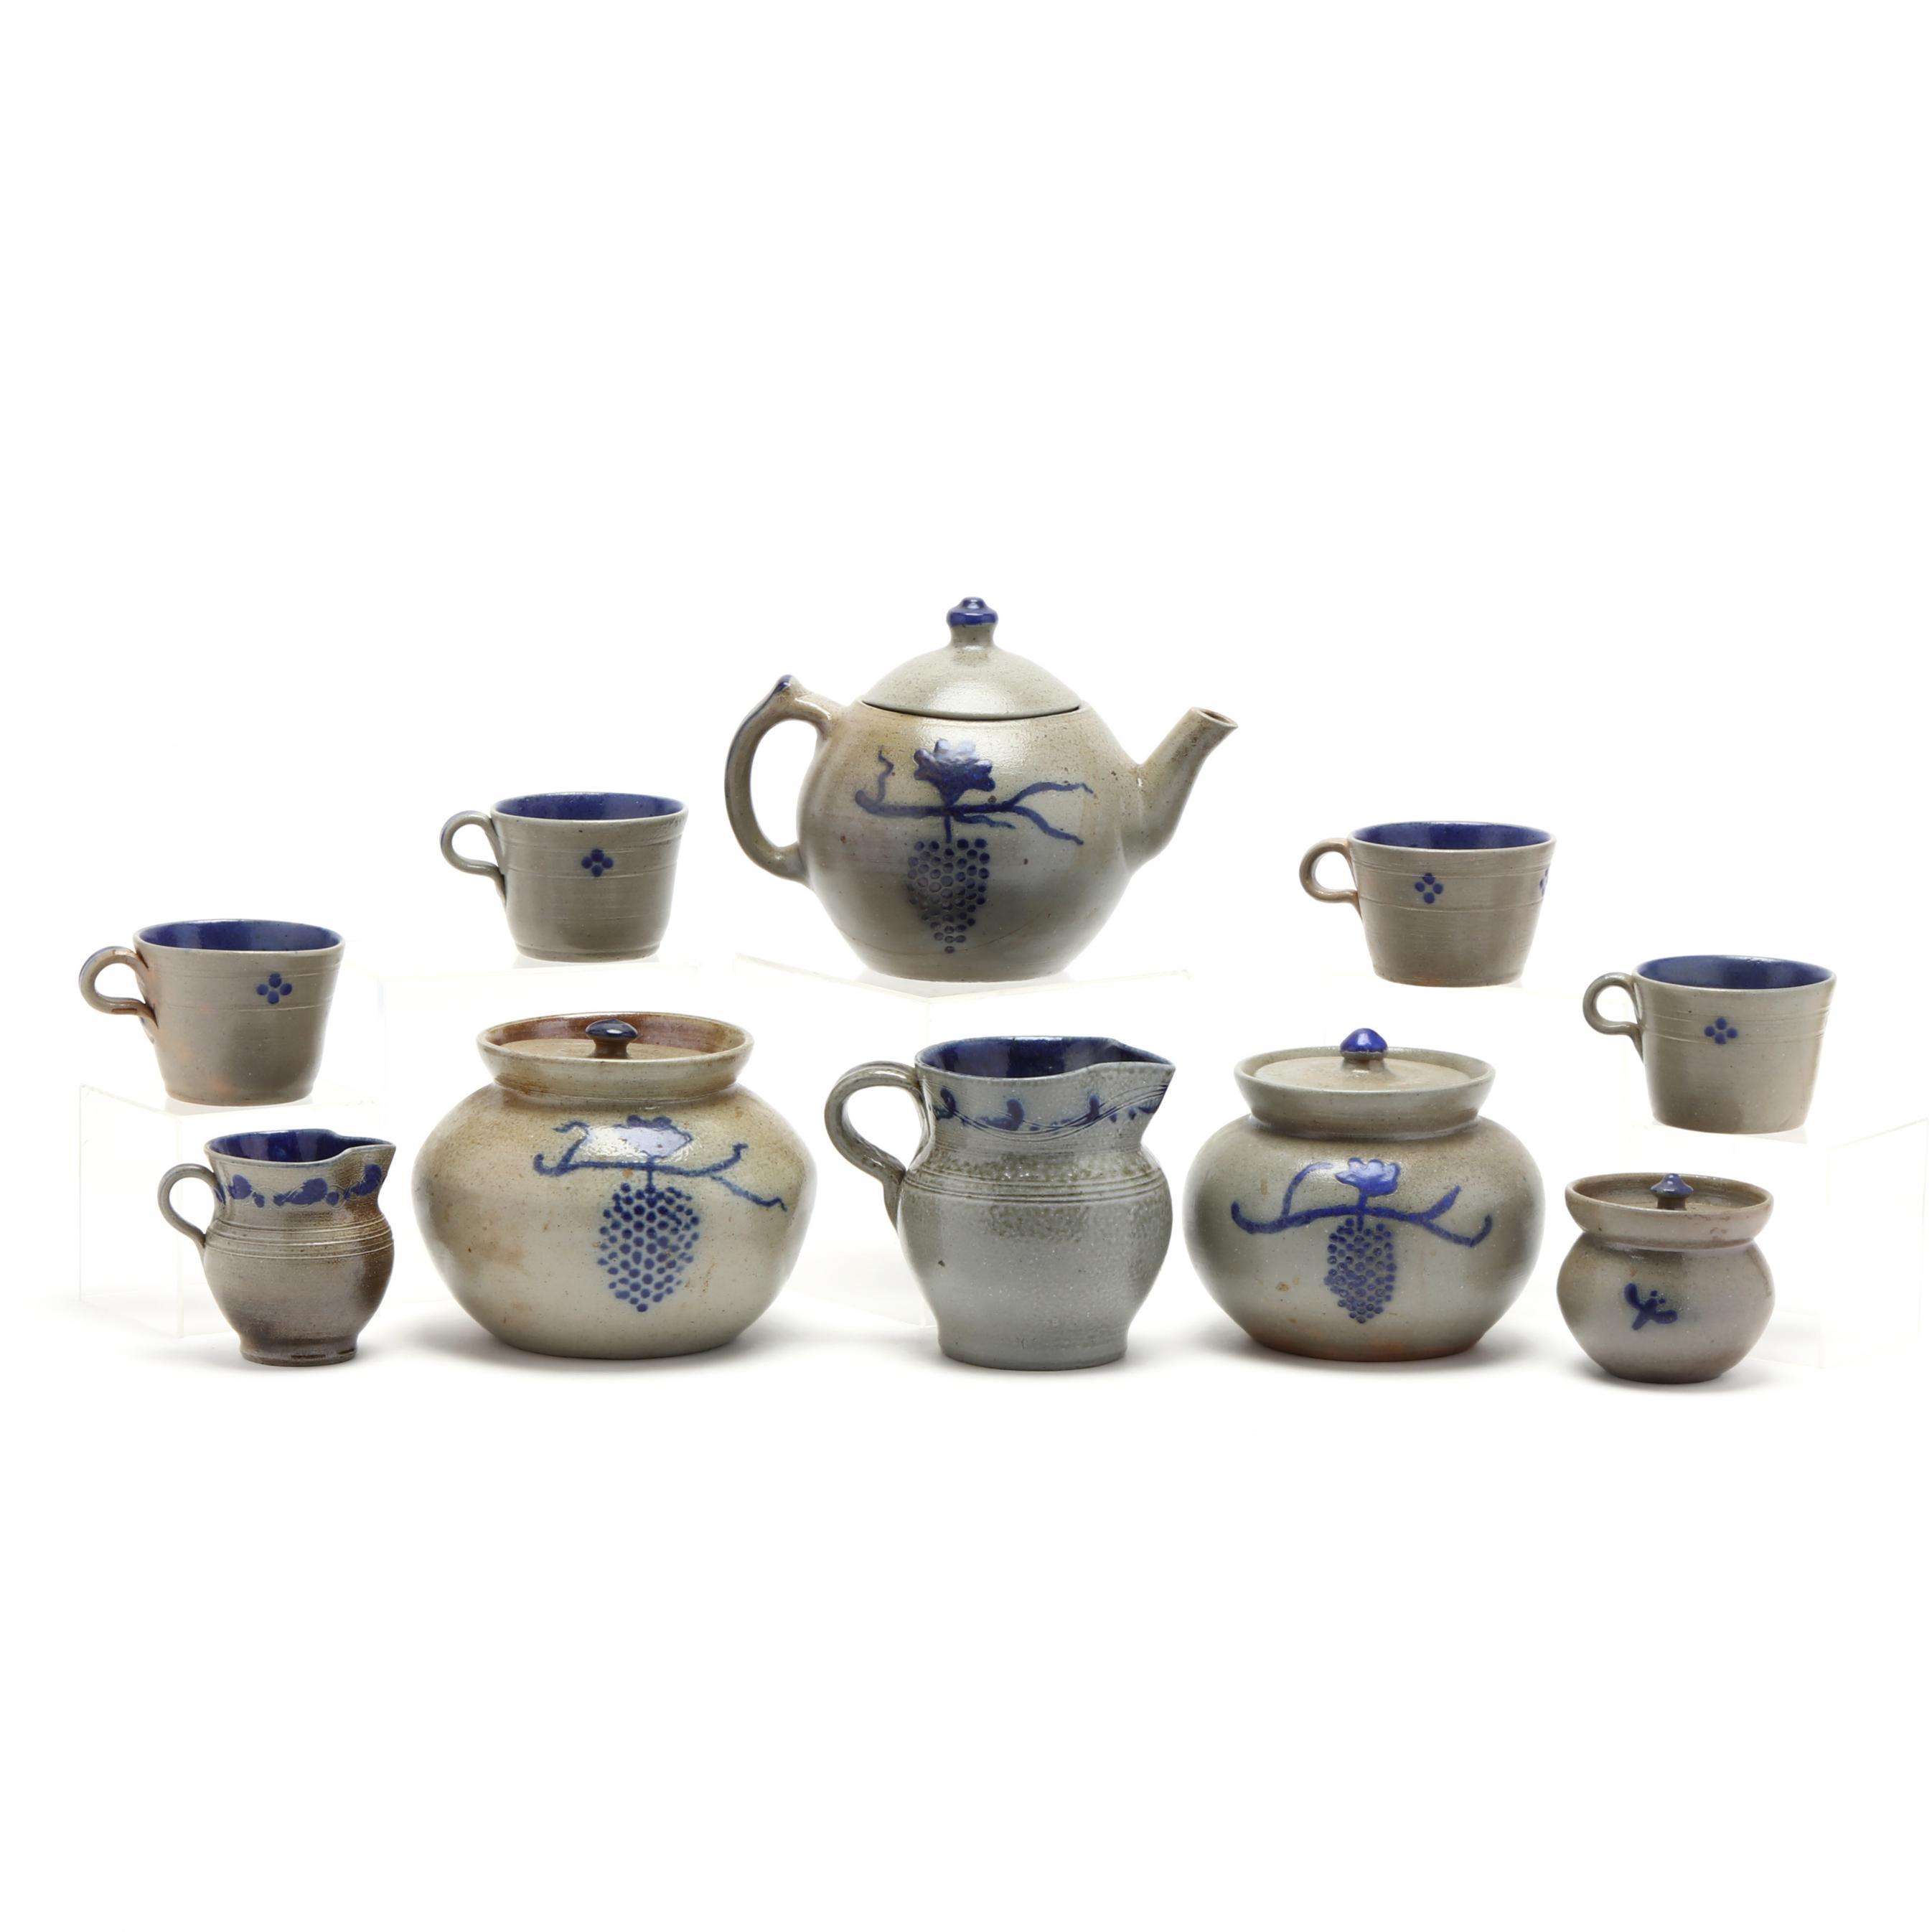 nc-pottery-a-ben-owen-master-potter-tea-service-of-ten-pieces